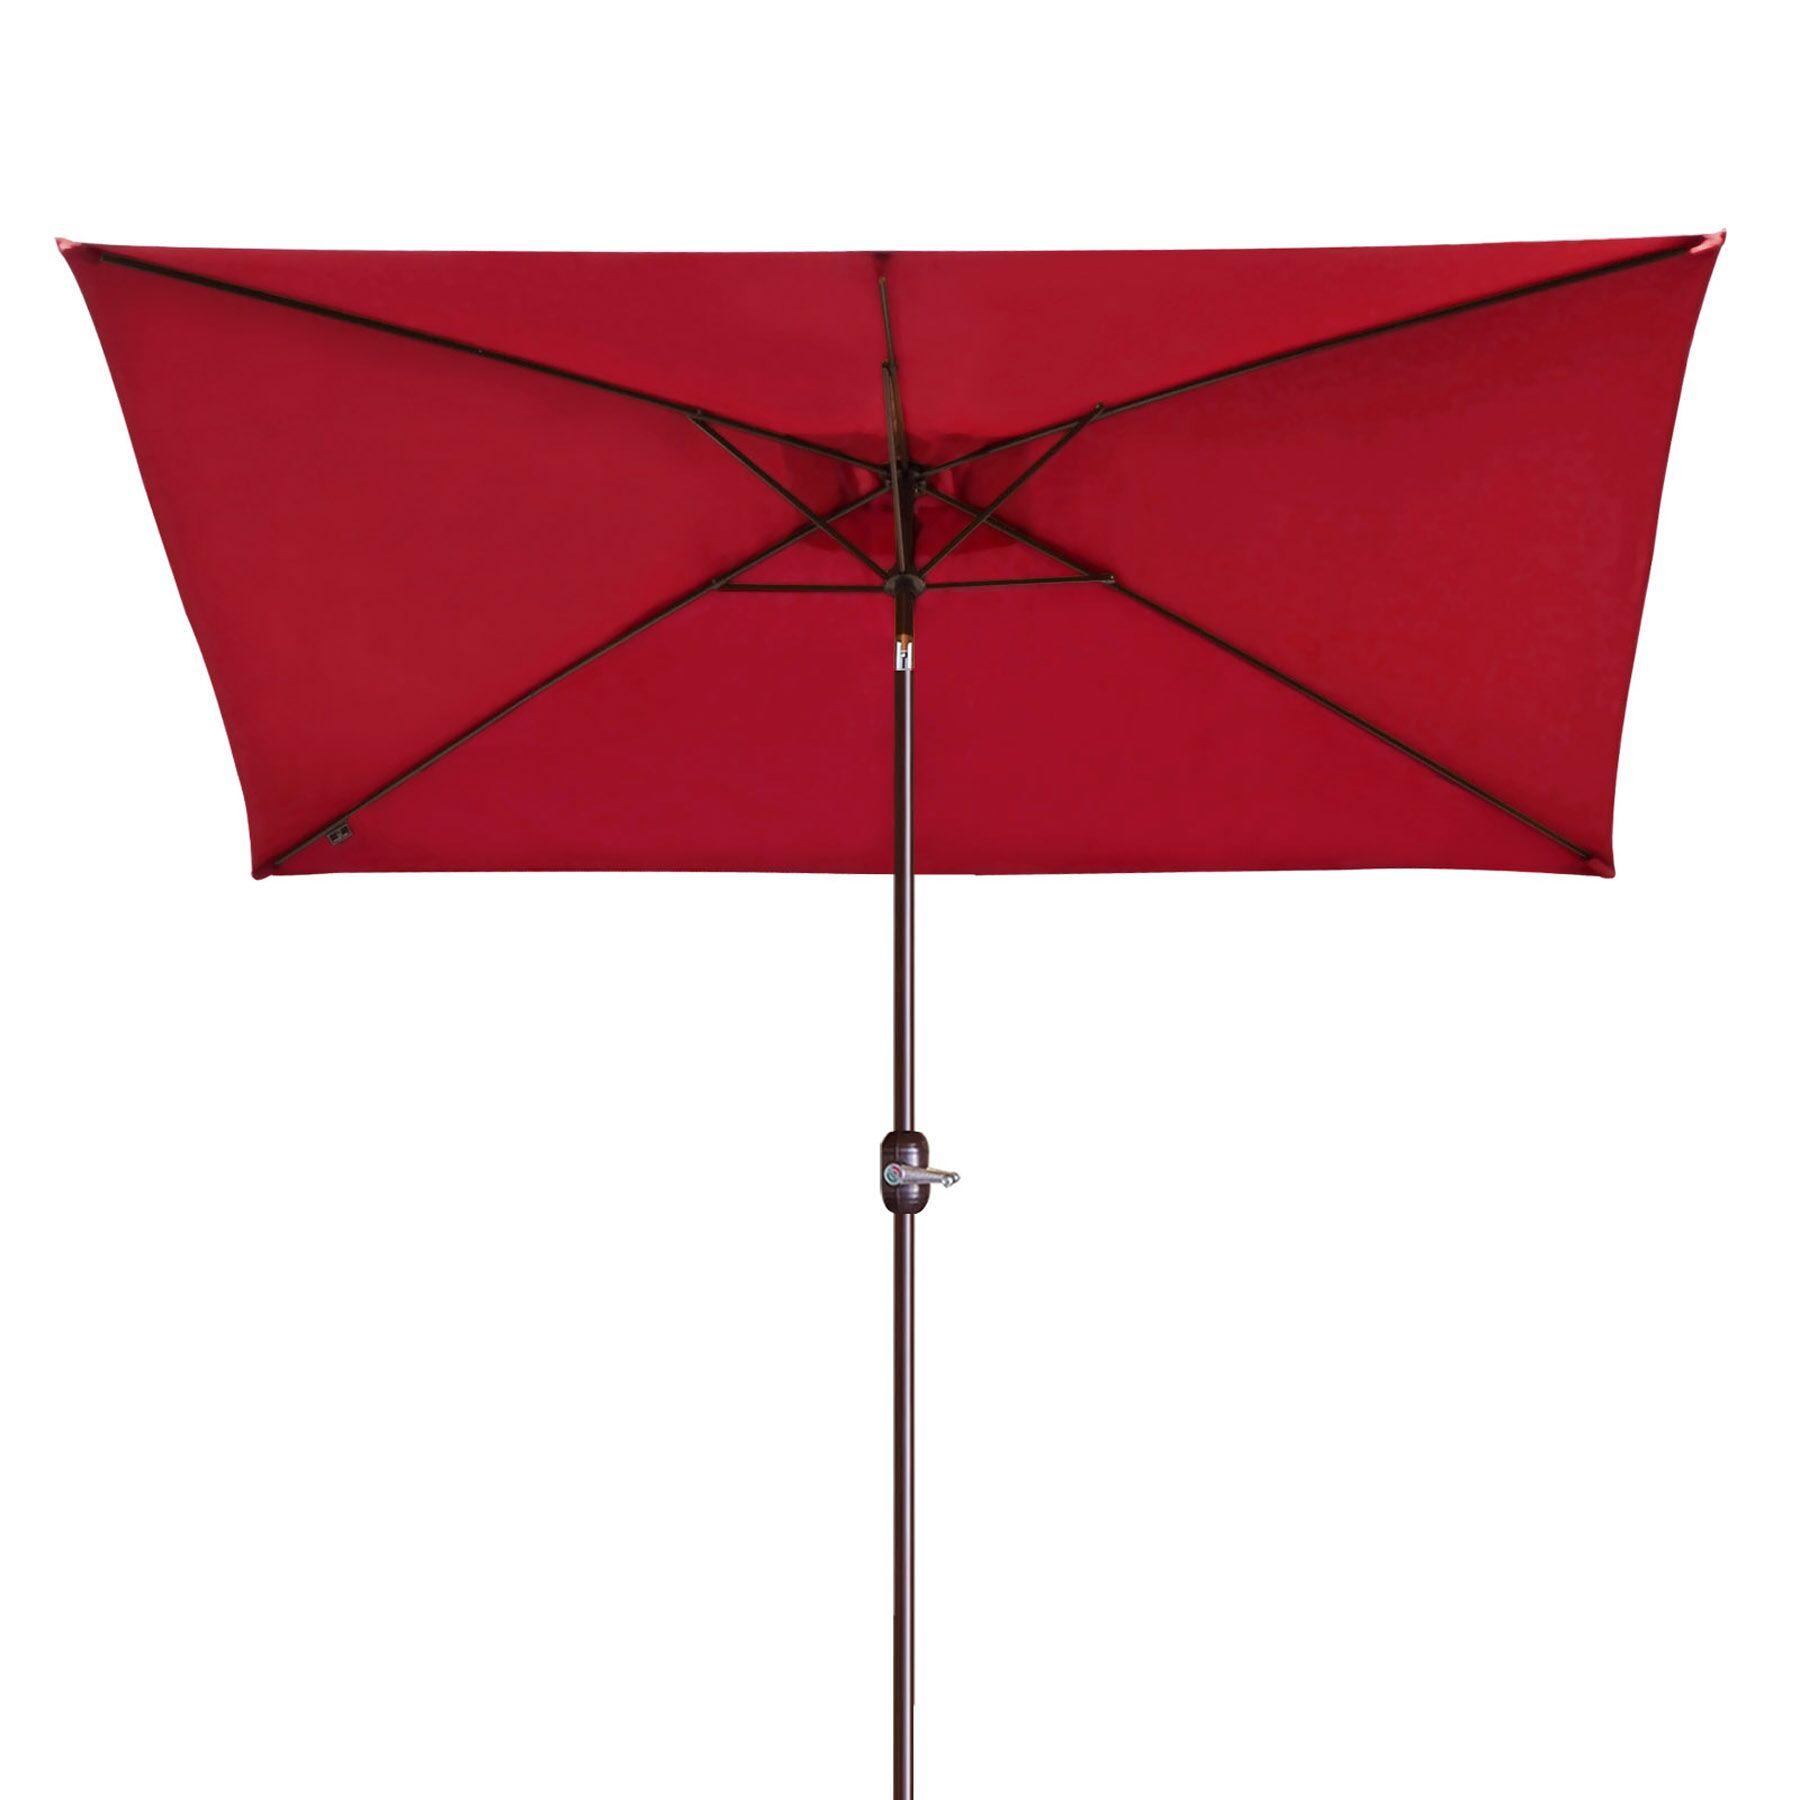 Bickford Outdoor Garden Patio Market Umbrella Fabric Color: Burgundy